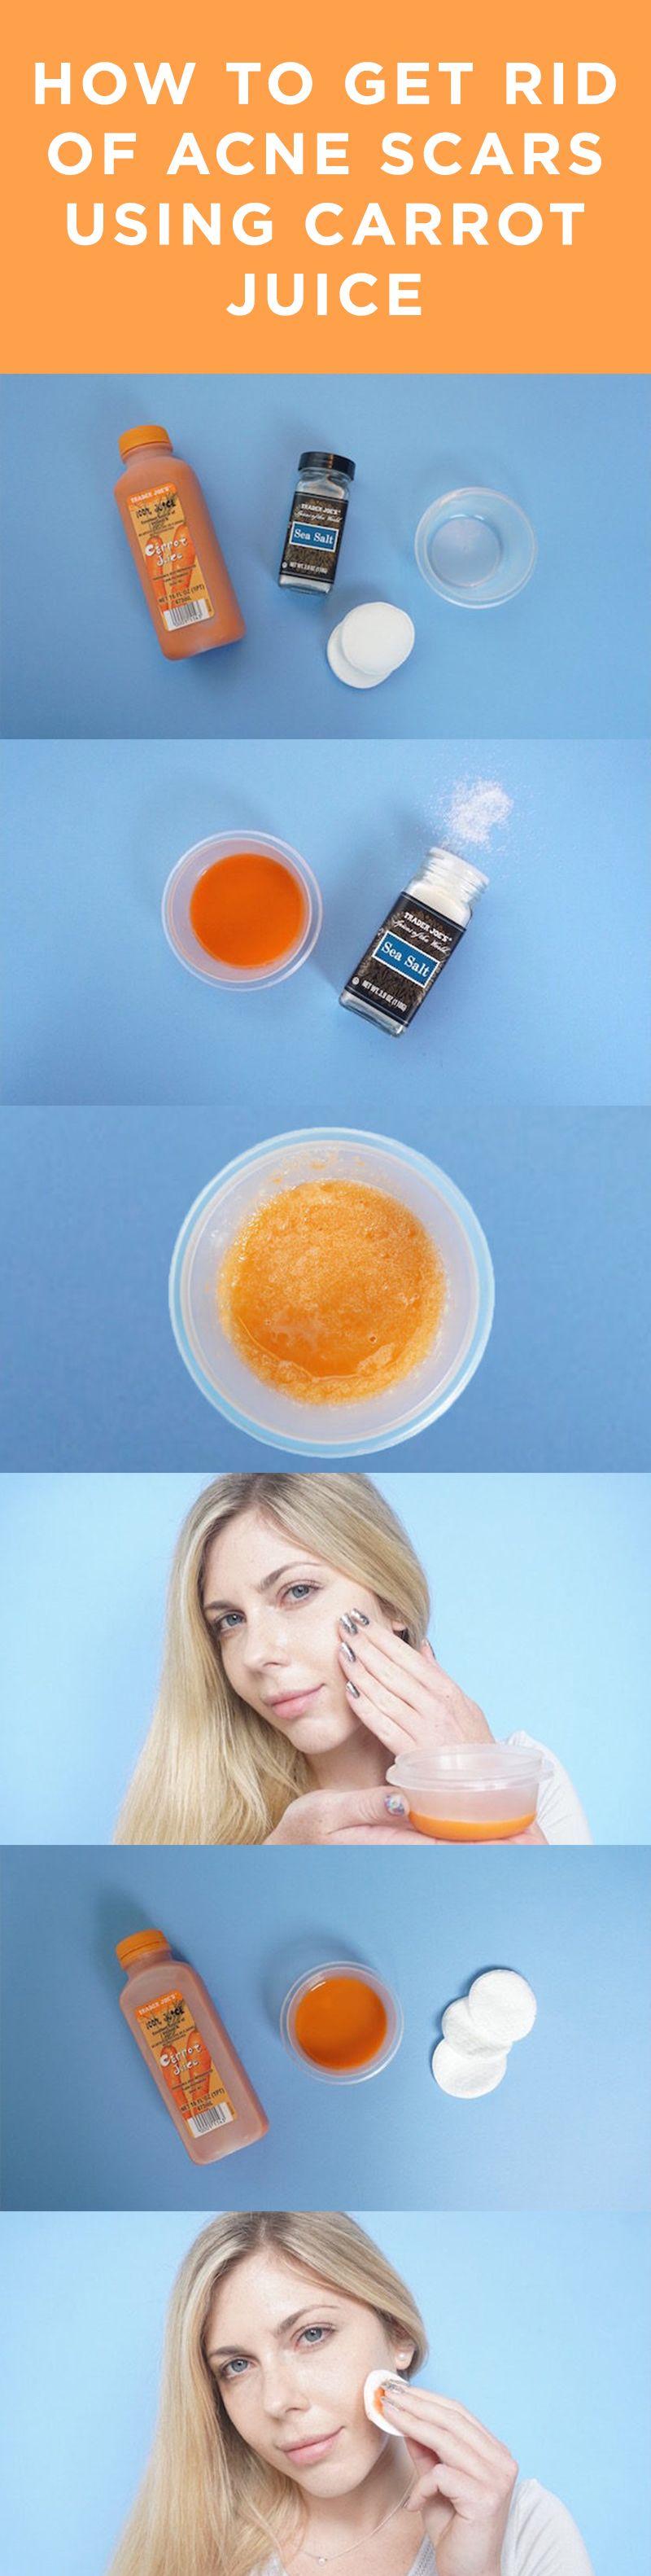 Say goodbye to acne scars for good. #DIY #BeautyHacks #AcneScars #CarrotJuice